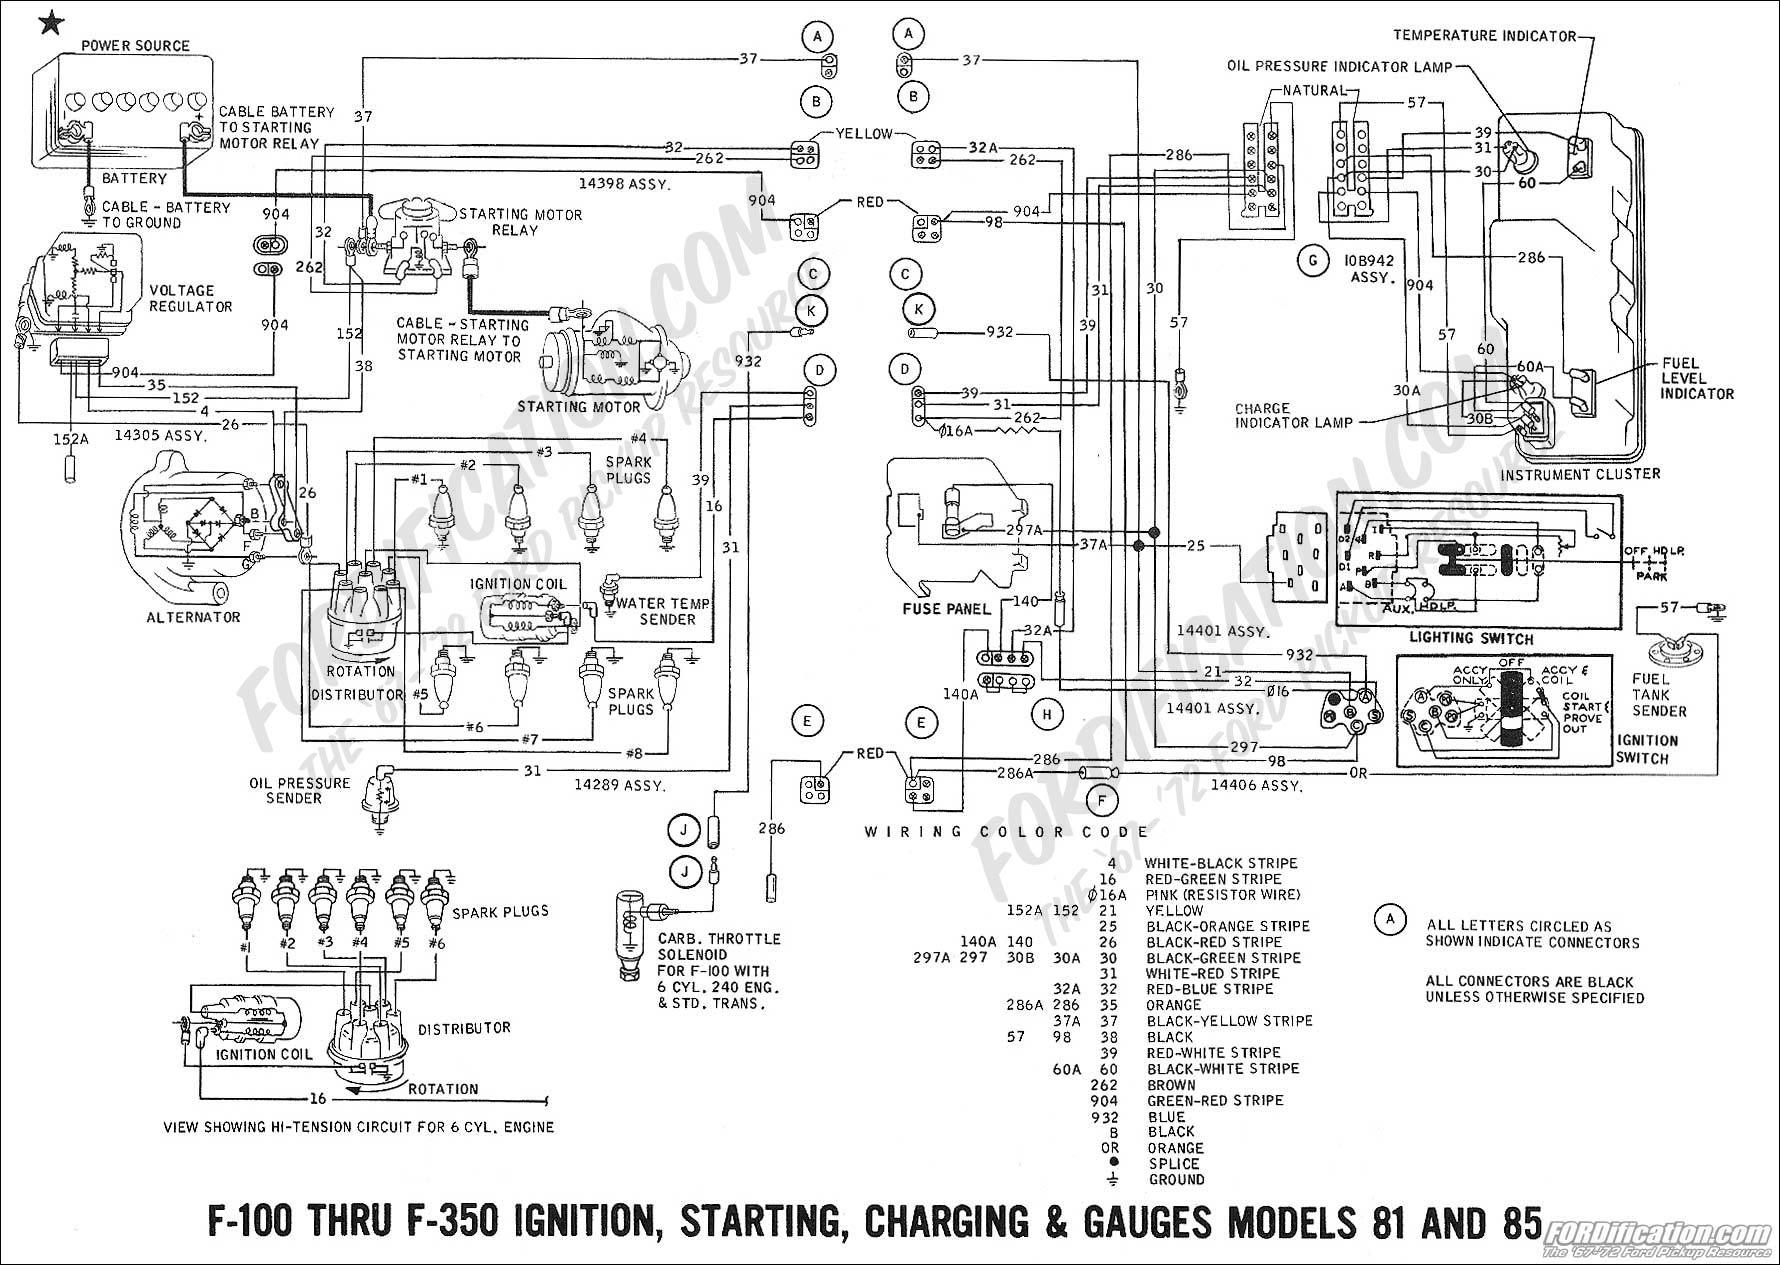 [DIAGRAM] 1975 Ford F600 Alternator Wiring Diagram FULL